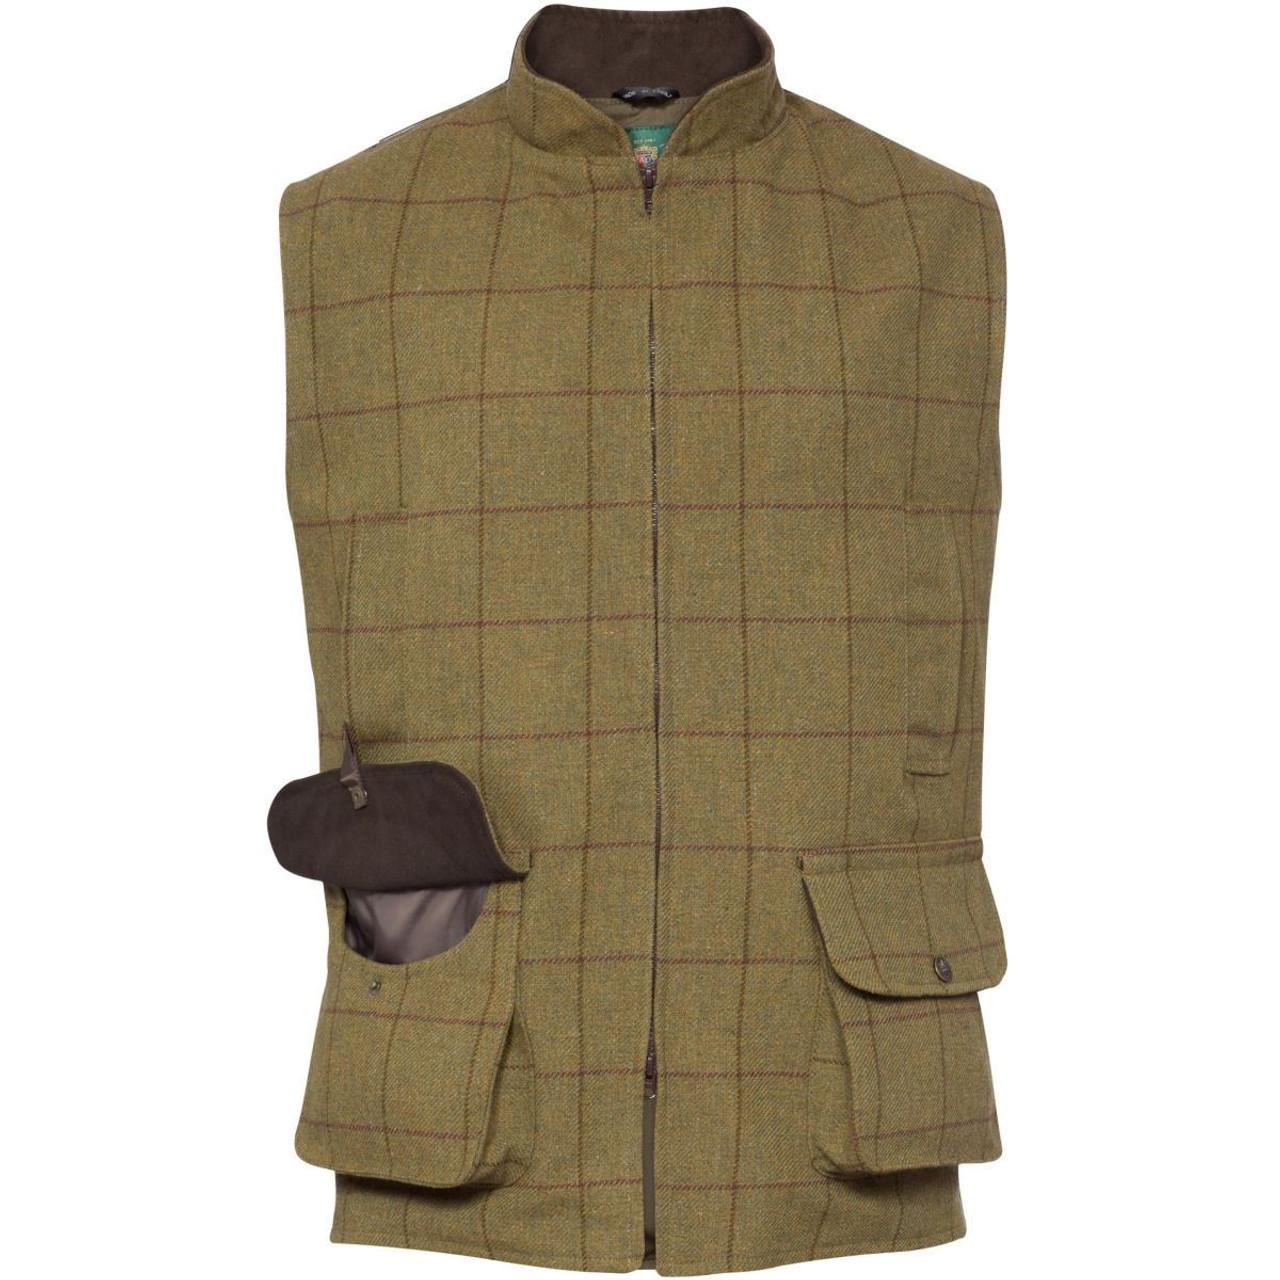 Alan Paine Rutland Waistcoat